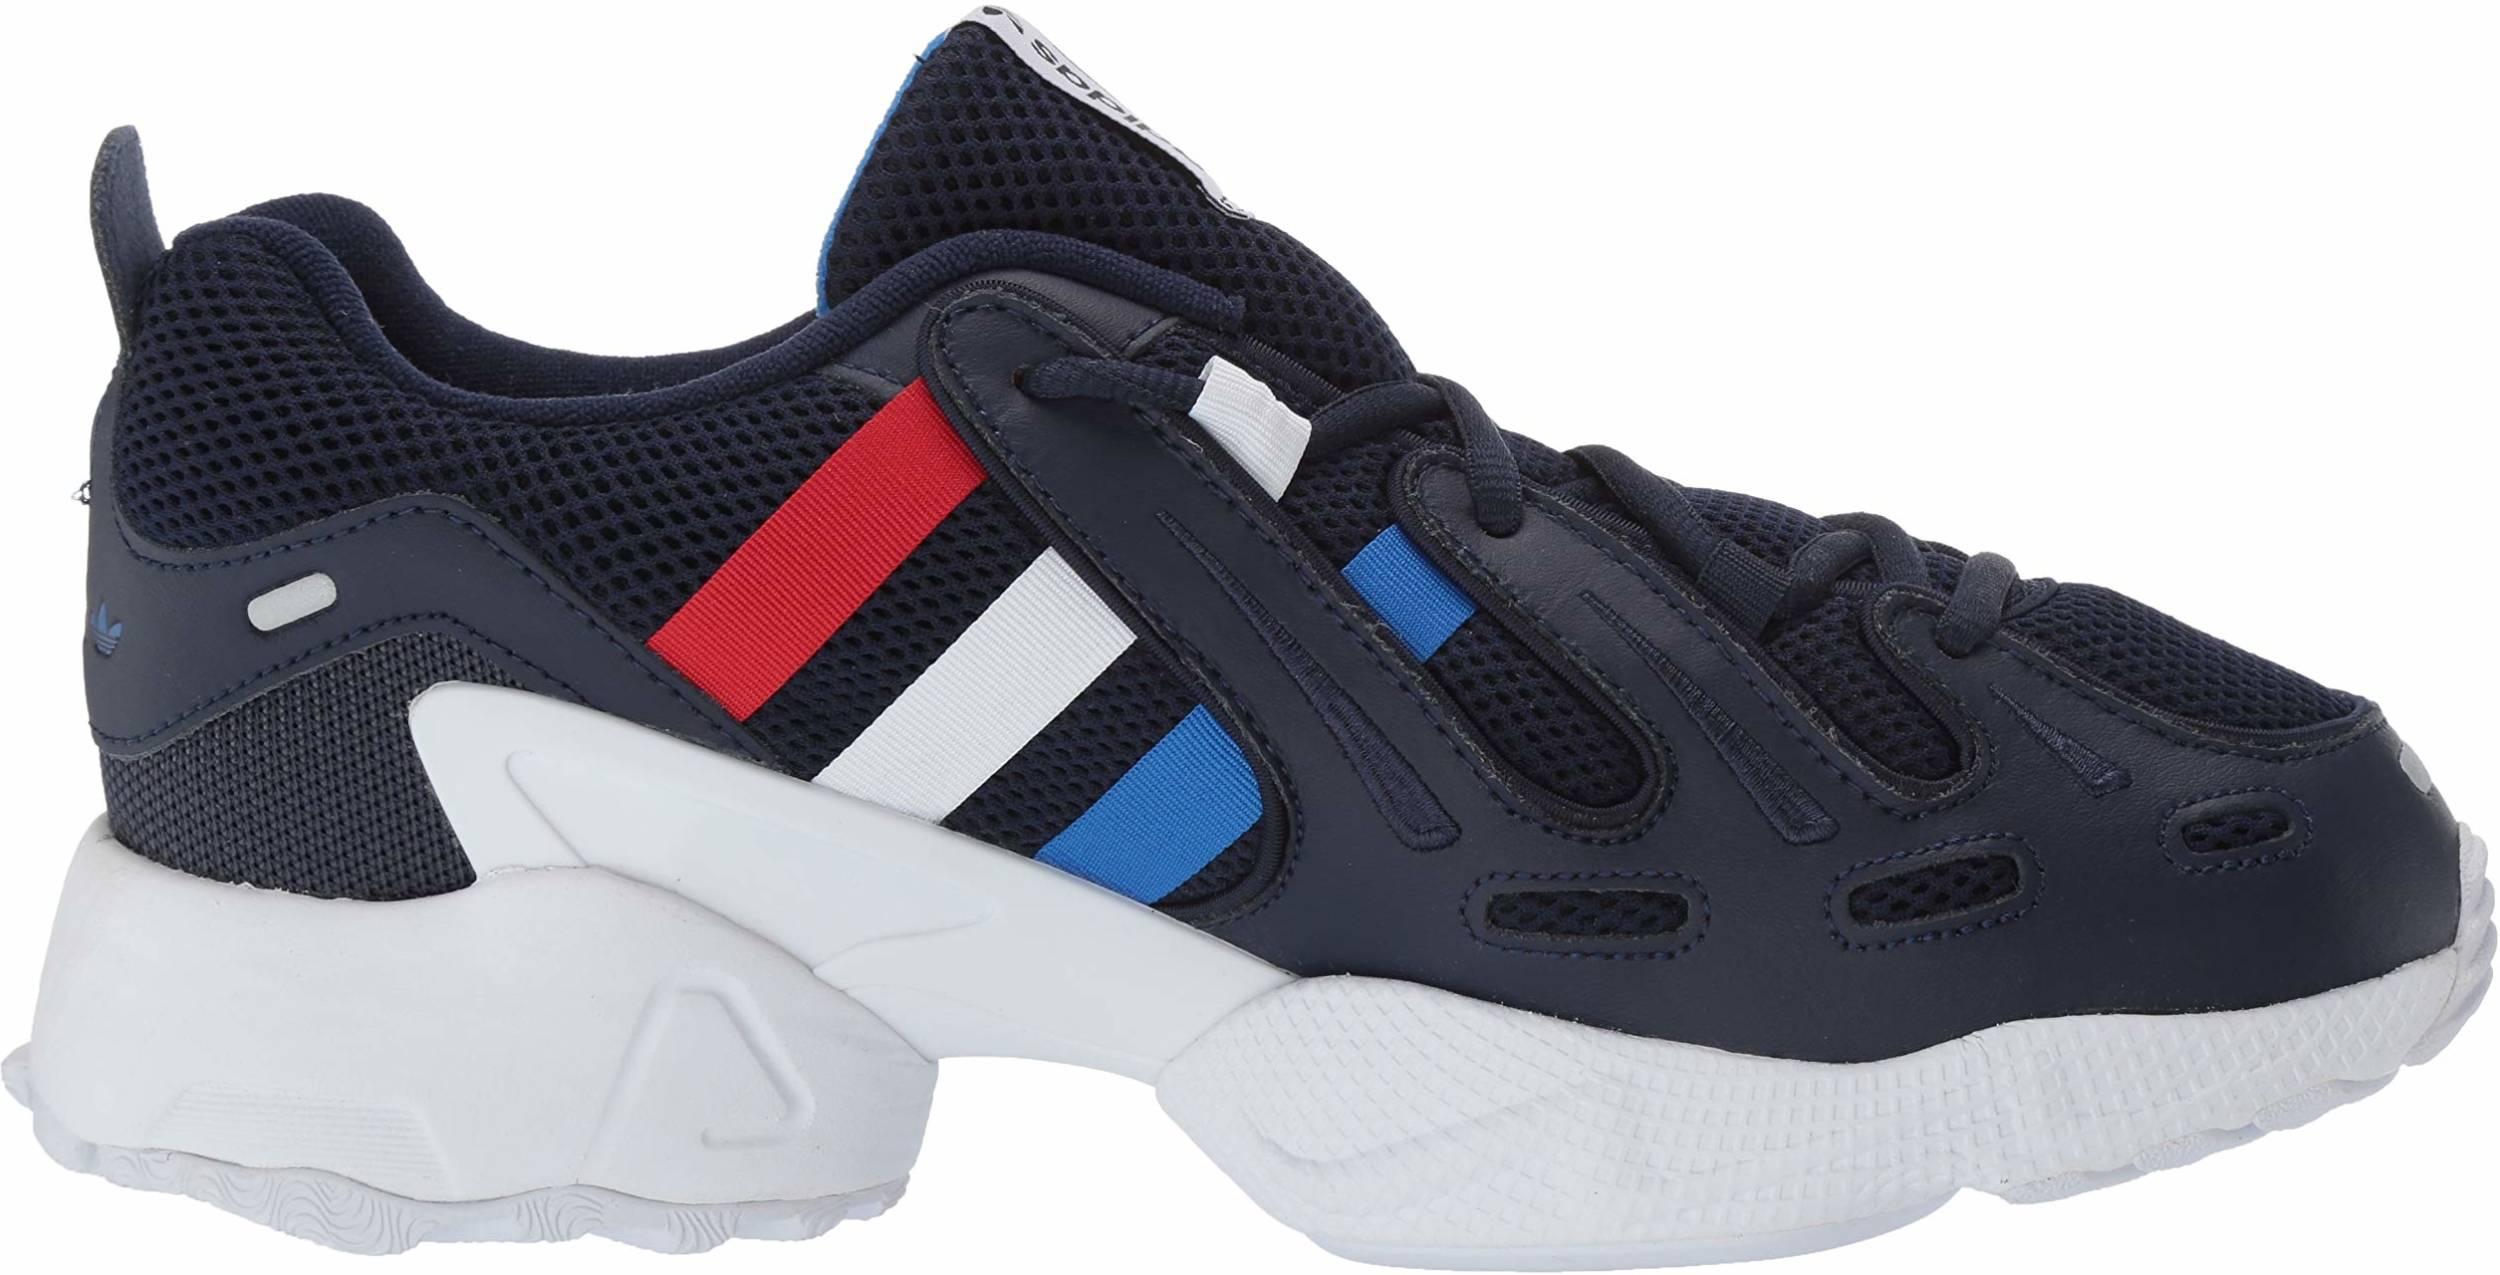 Memorizar brumoso Laboratorio  Save 51% on Adidas Gazelle Sneakers (17 Models in Stock) | RunRepeat